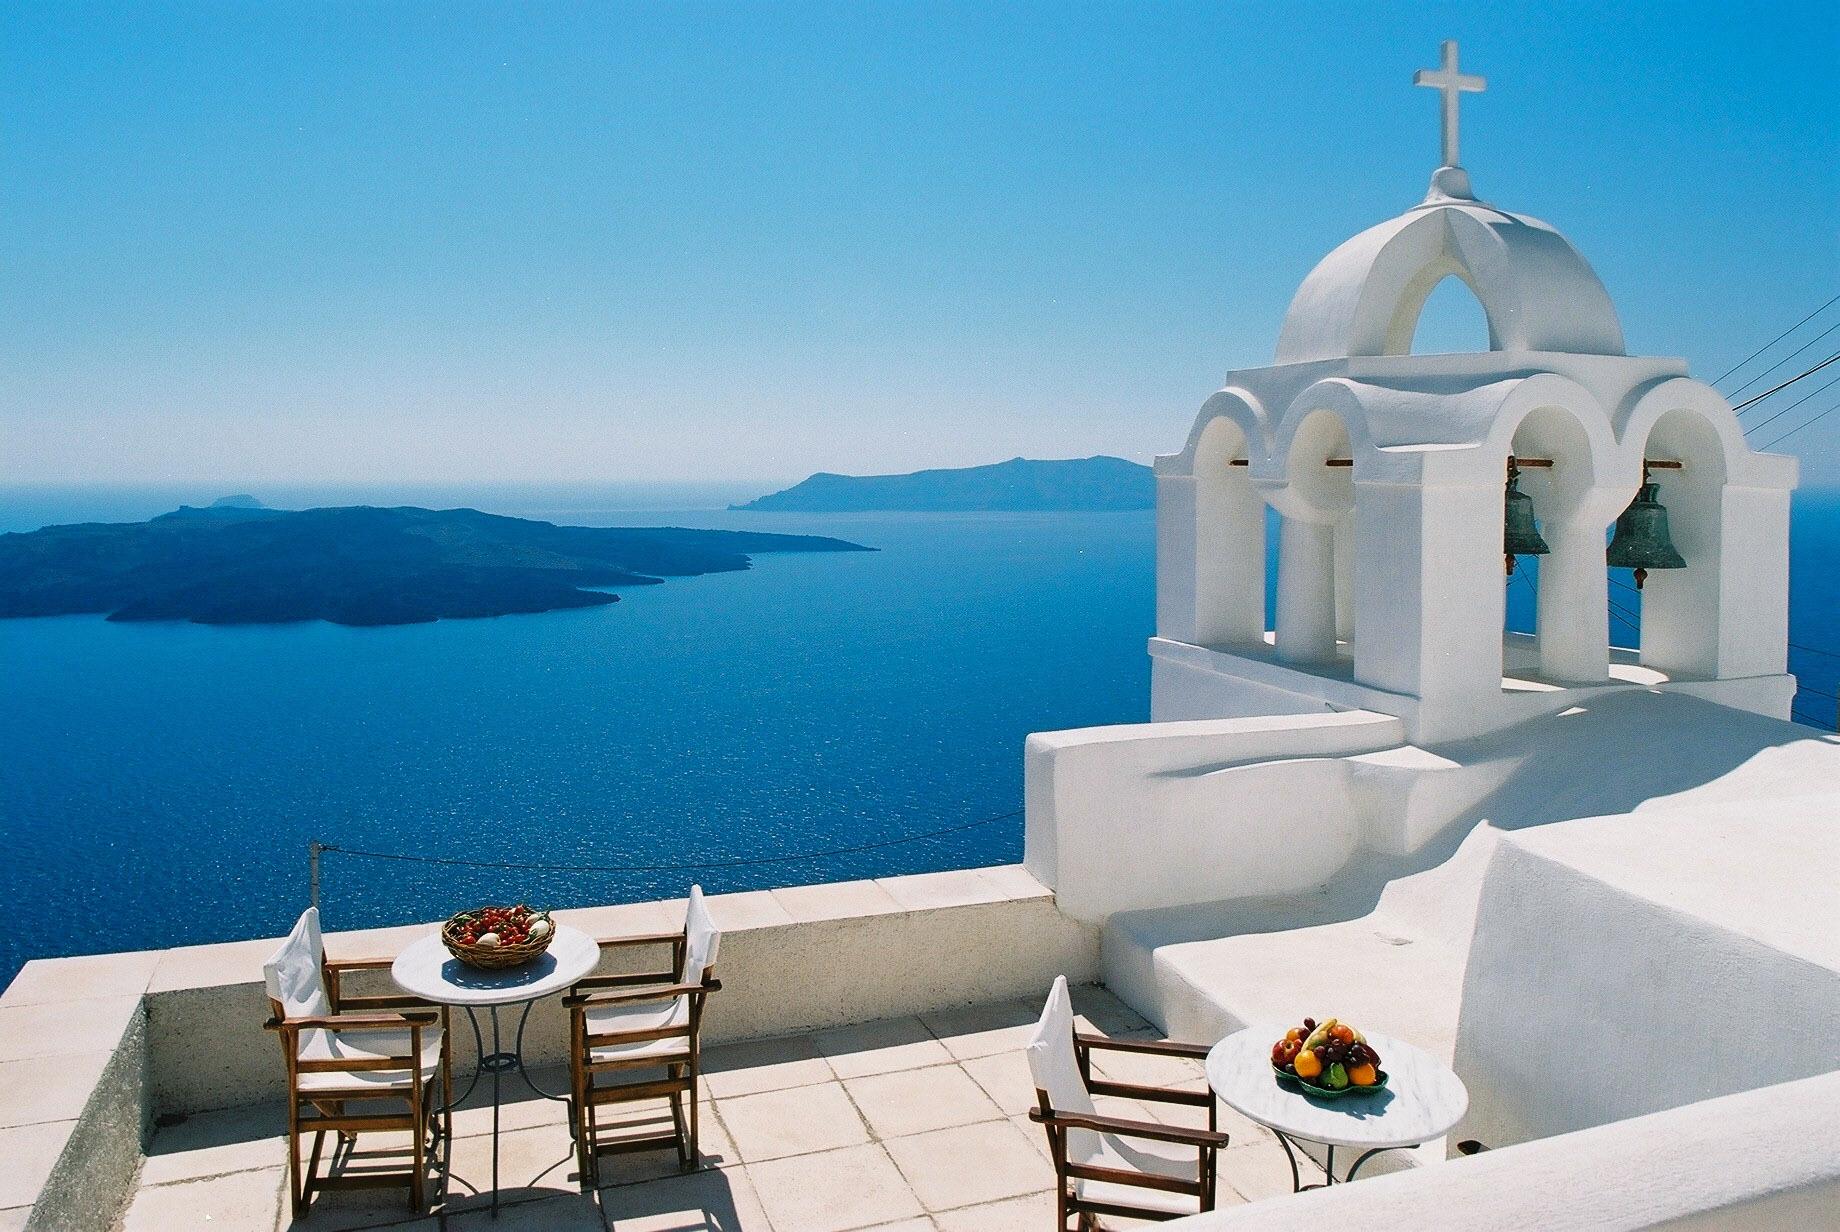 Остров Санторини - почивка с полет от София